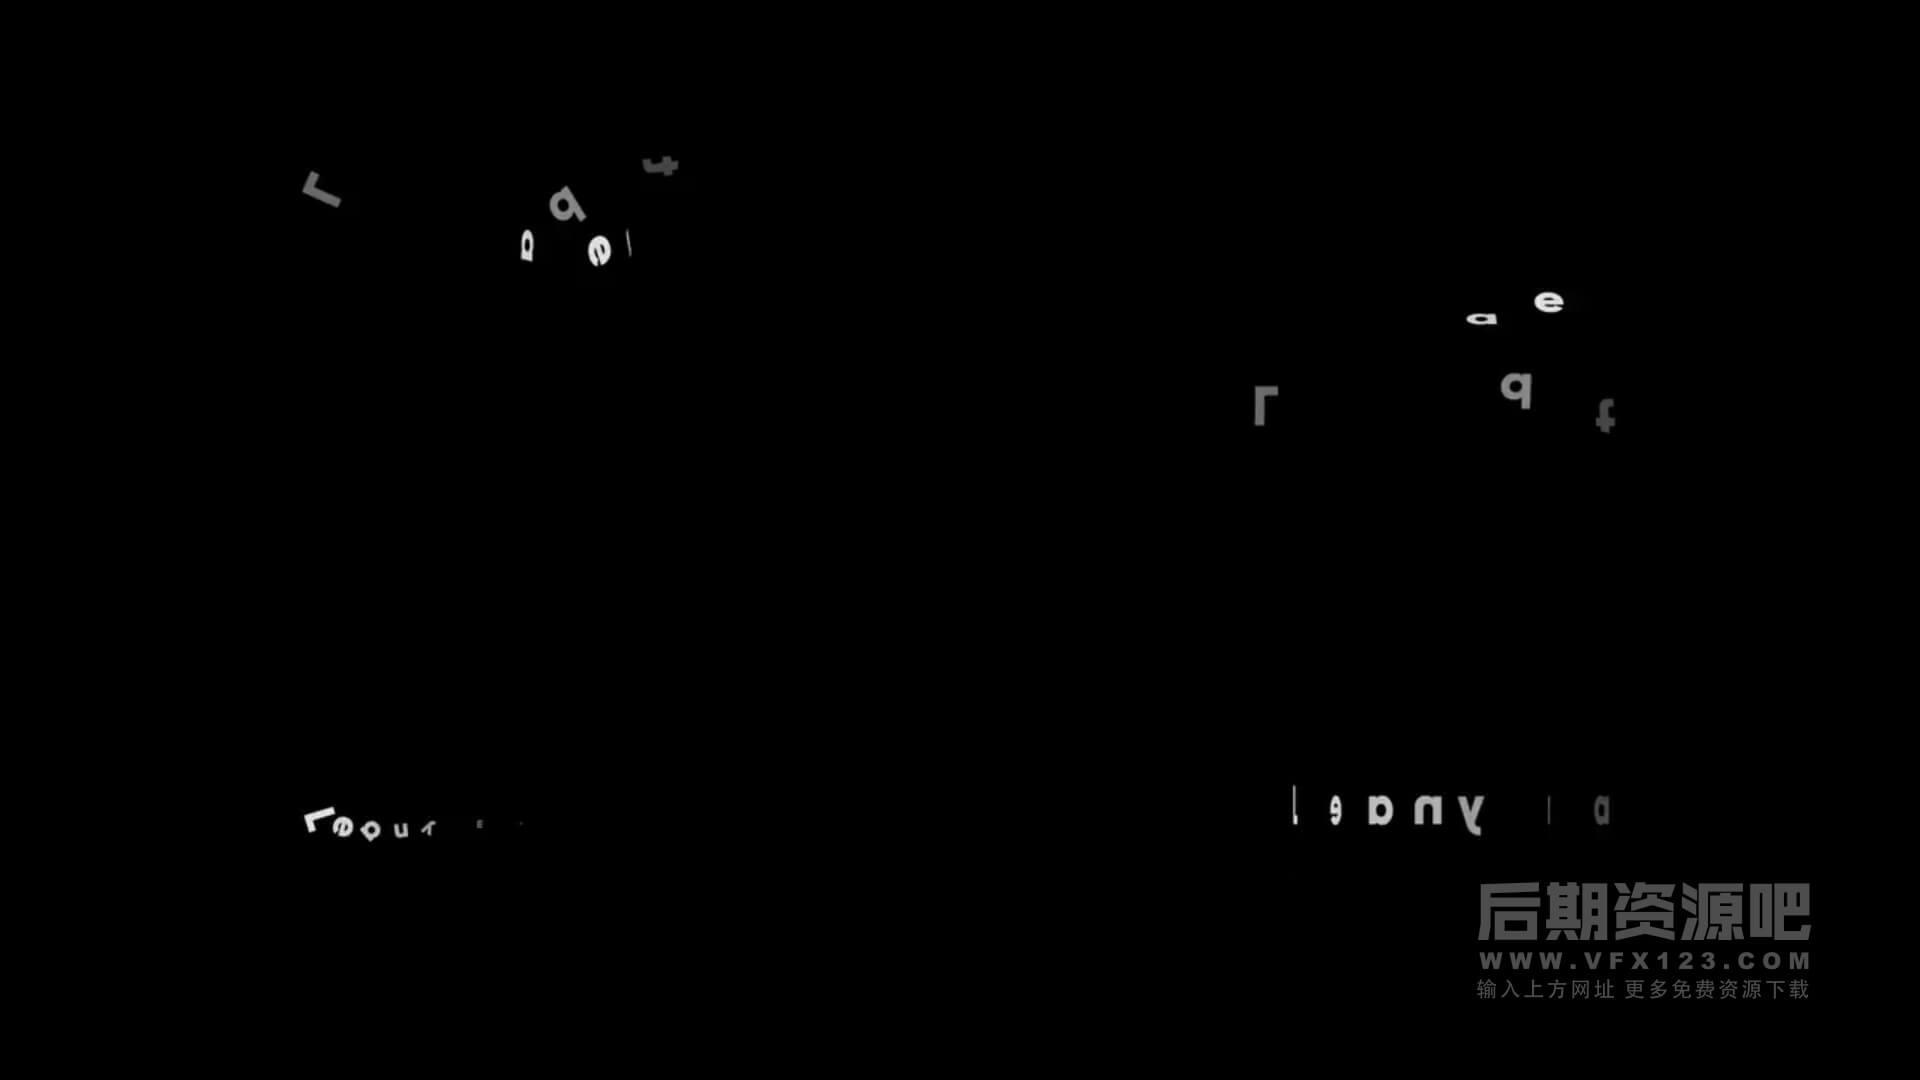 fcpx插件 50组简洁干净文字动画预设模板含进出场 Text Animations